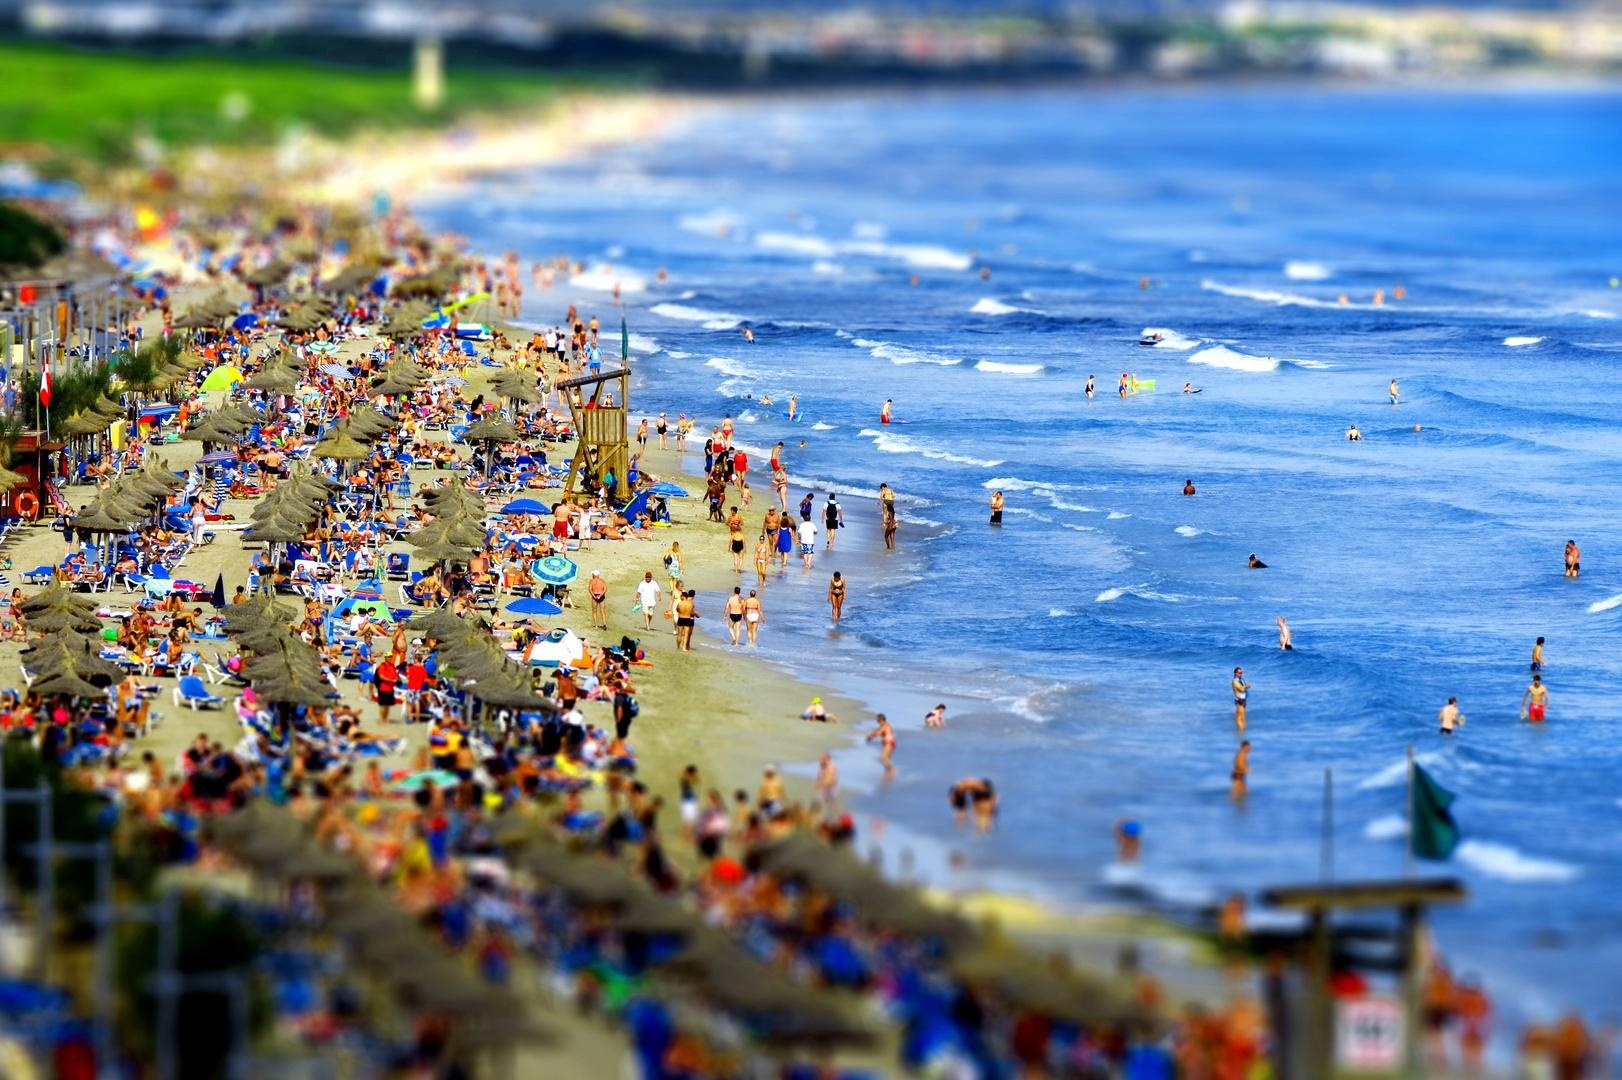 Buntes Treiben am Strand